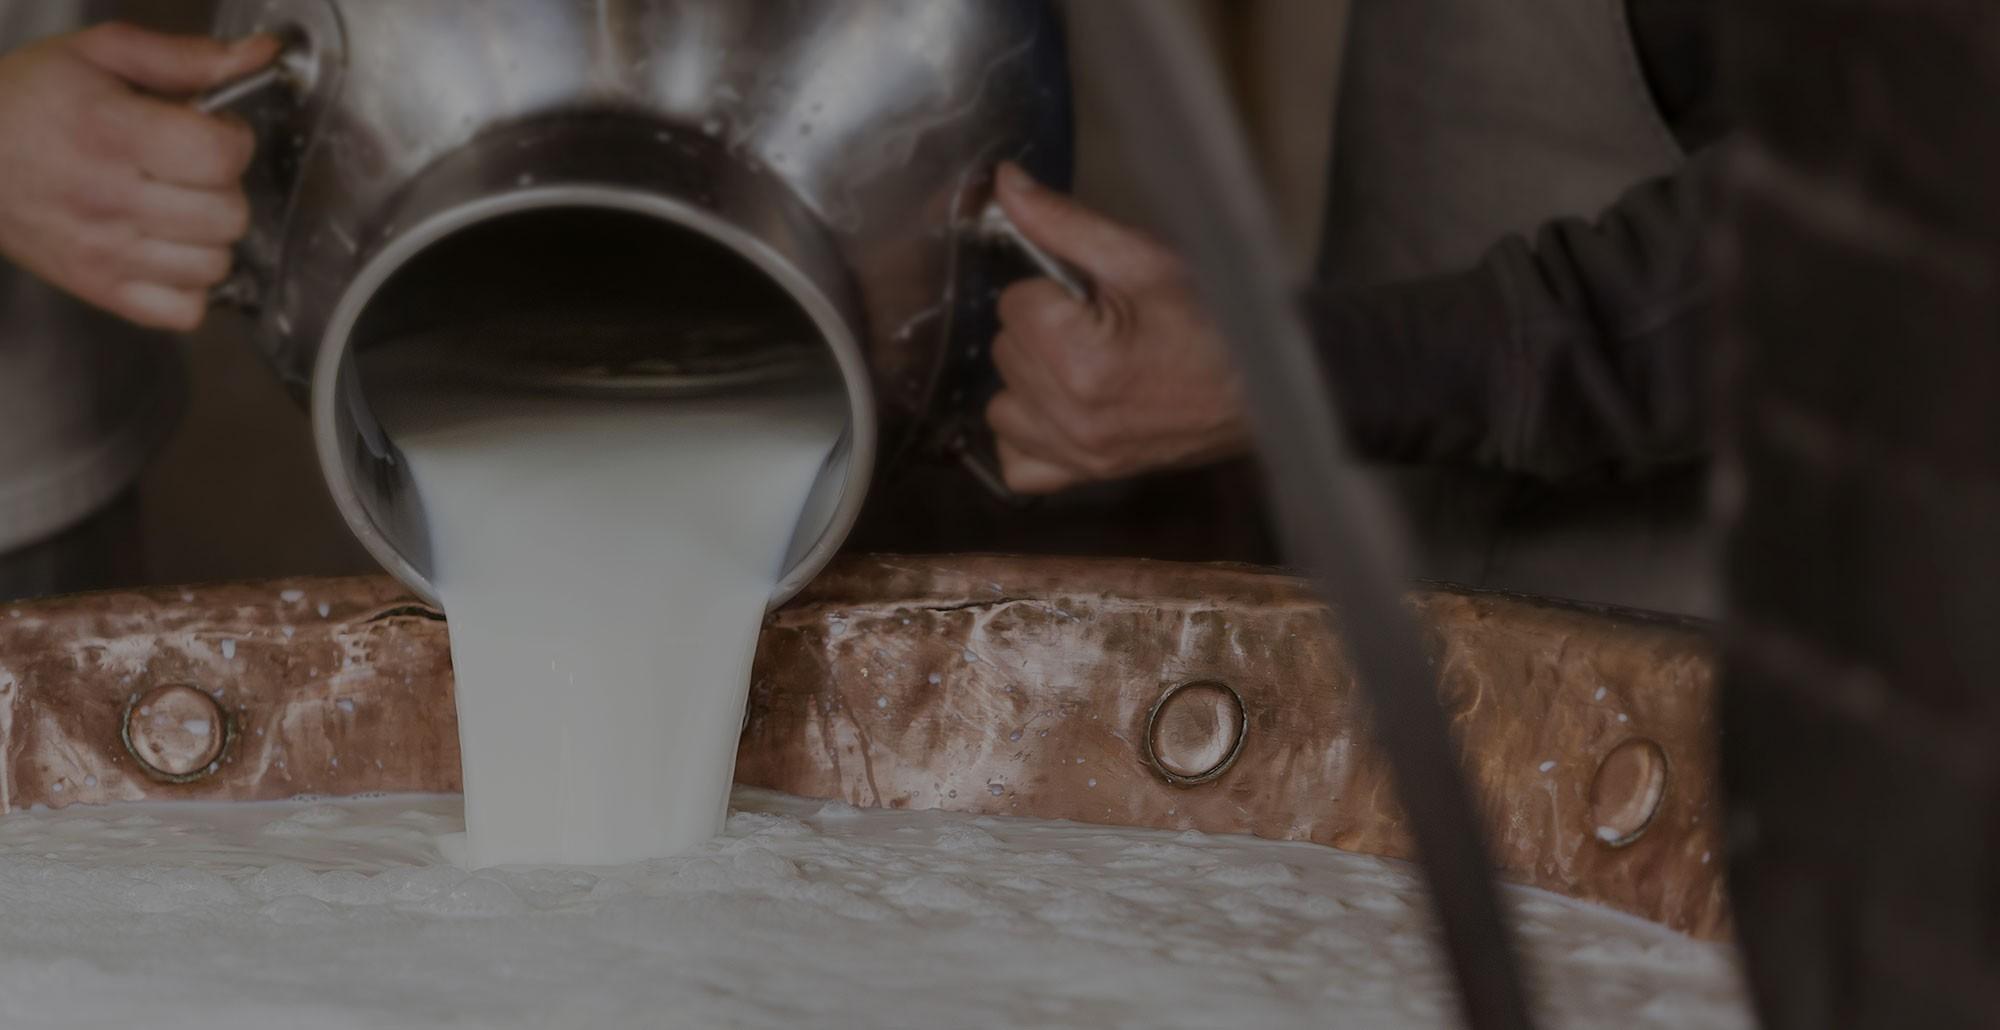 Parmigiano DOP, direkt zu dir nach Hause